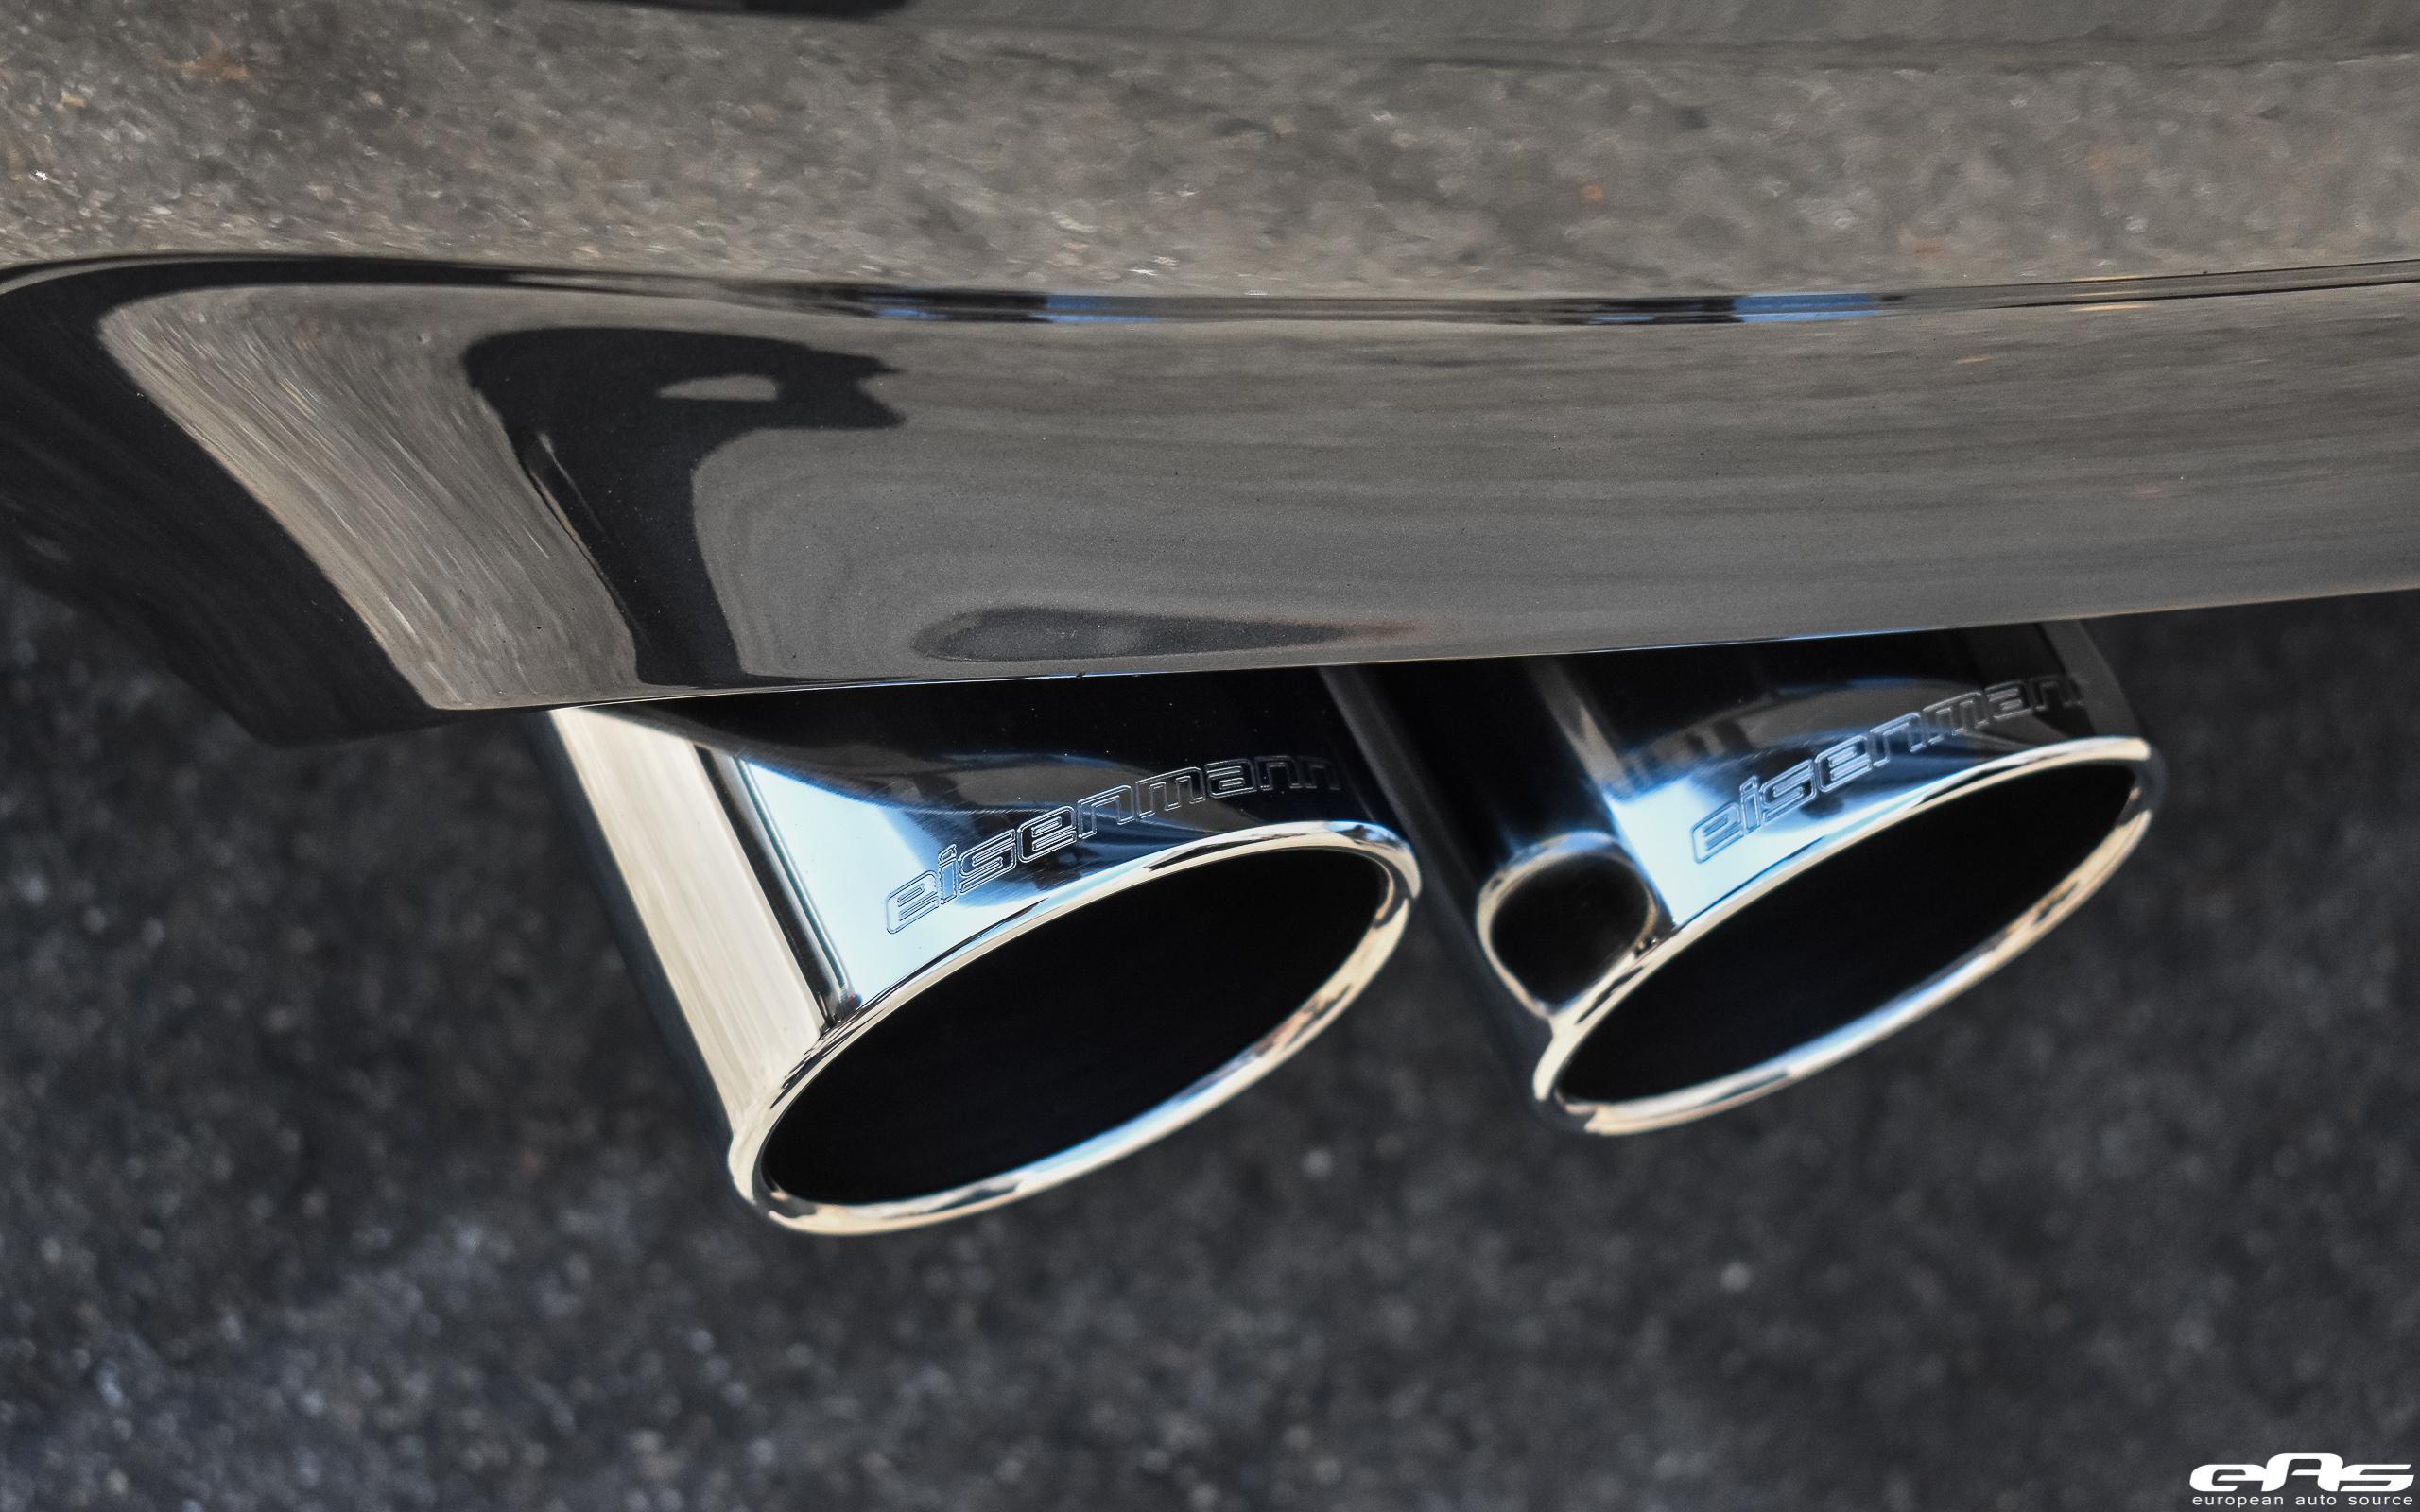 Singapore Gray BMW M5 Gets An Eisenmann Exhaust System Installed 11